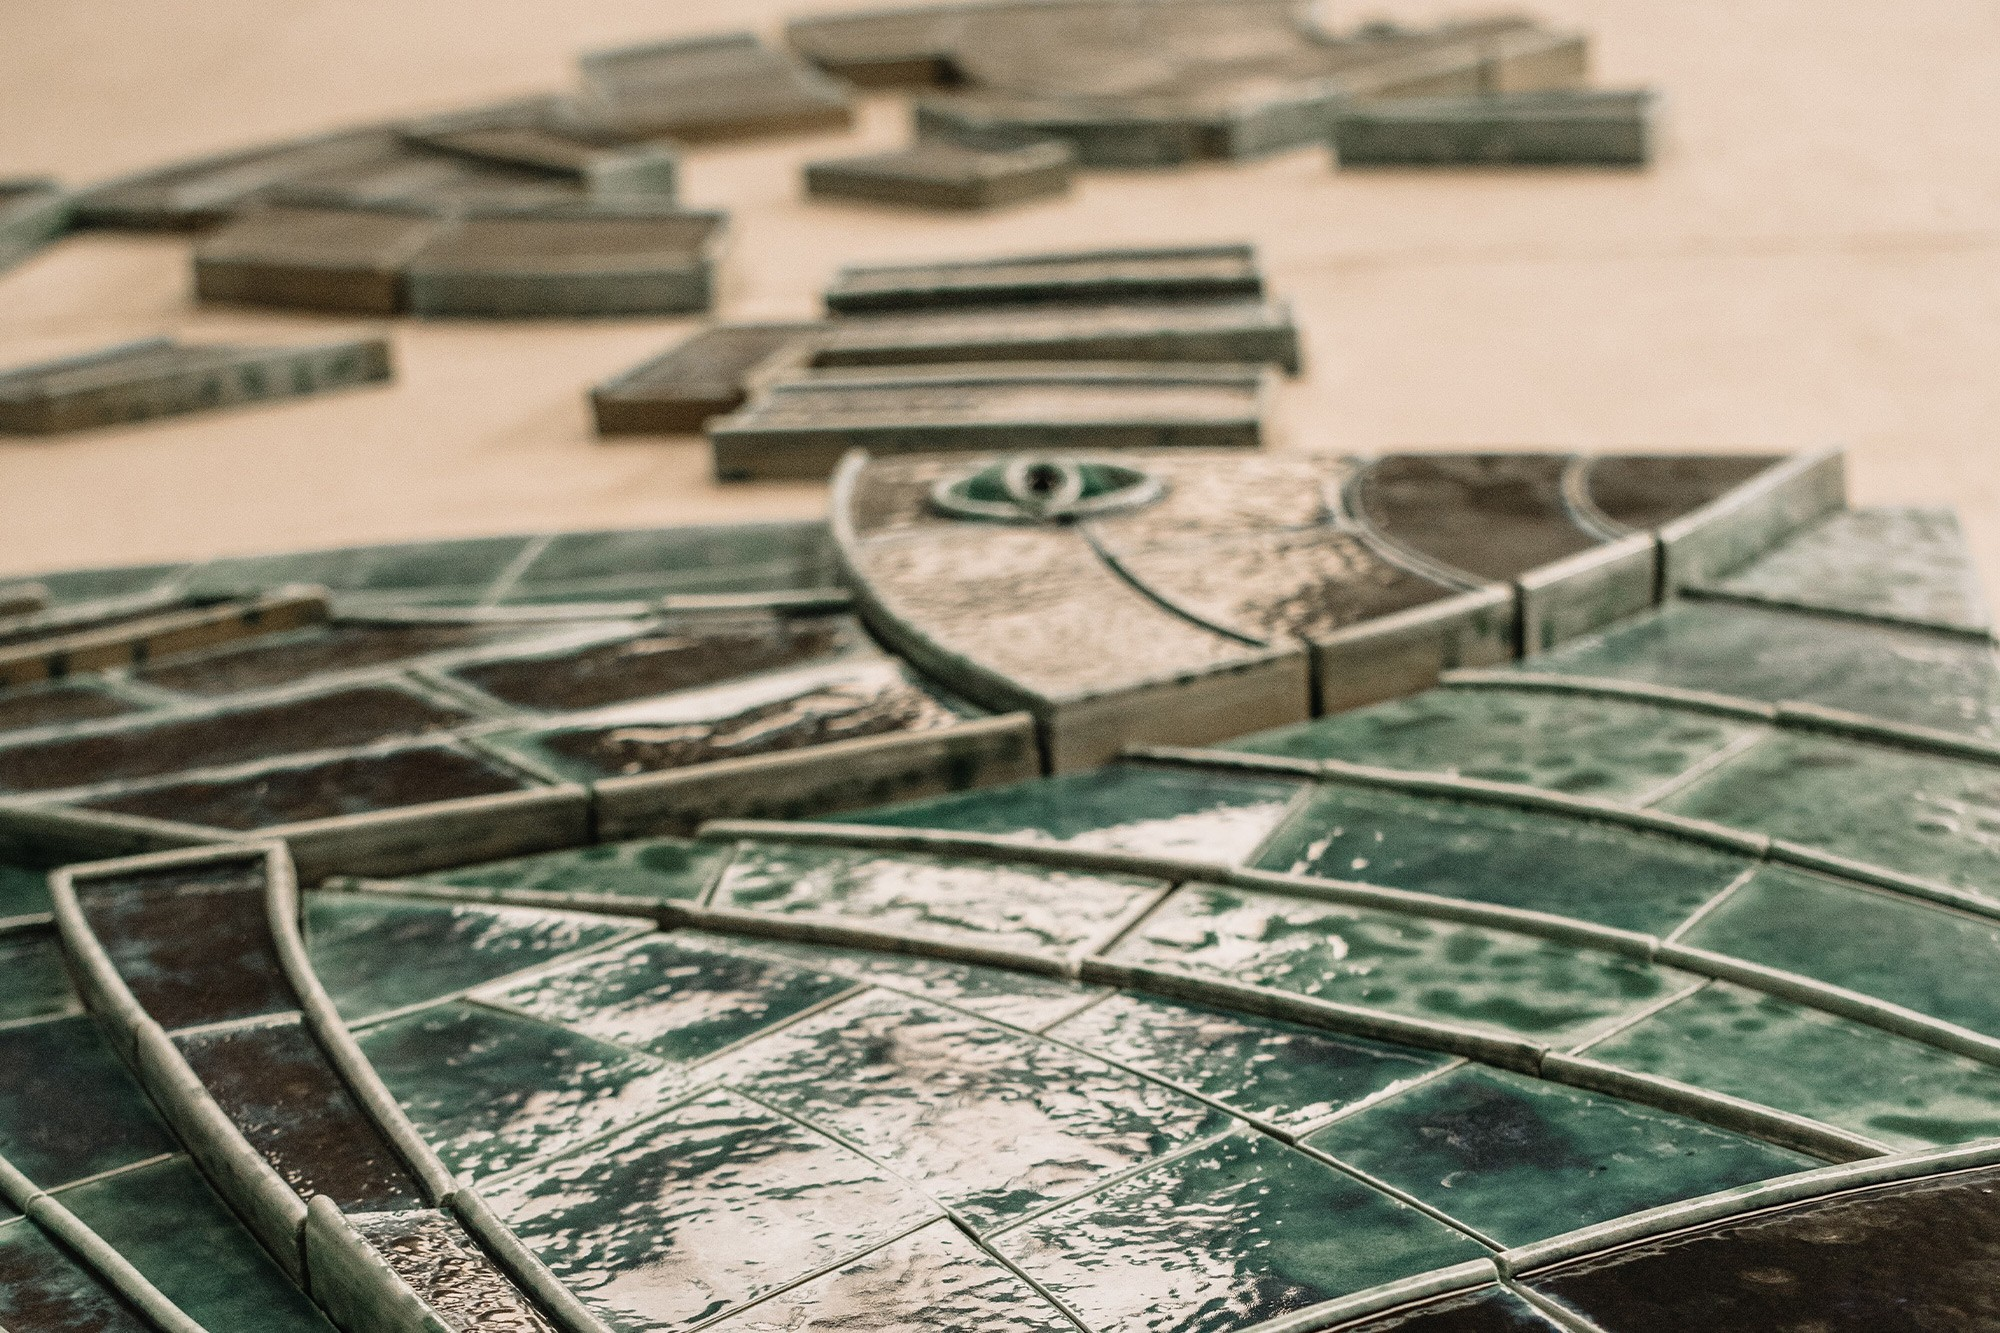 azulejos mosaico - Azulejos Tipo Mosaico